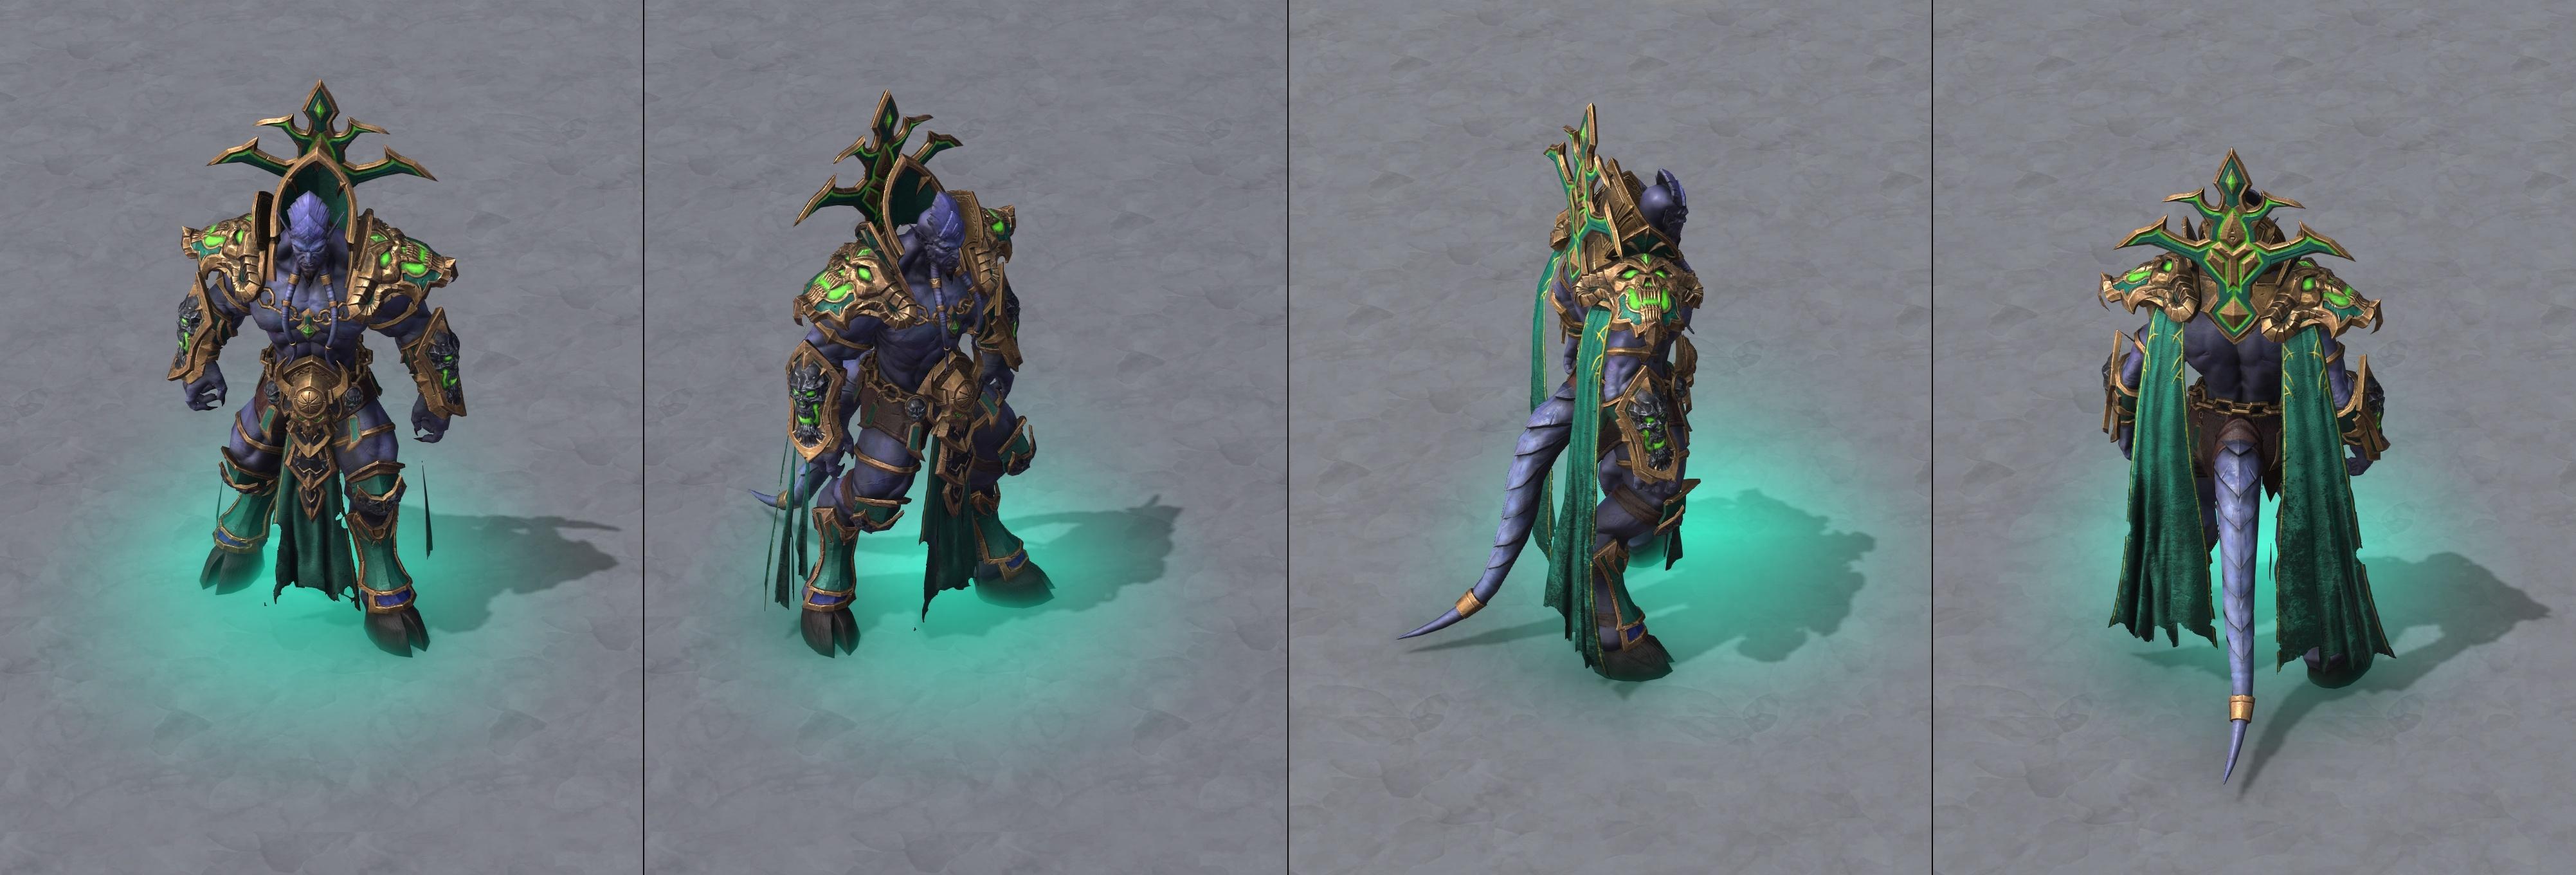 Warcraft III Reforged : Archimonde